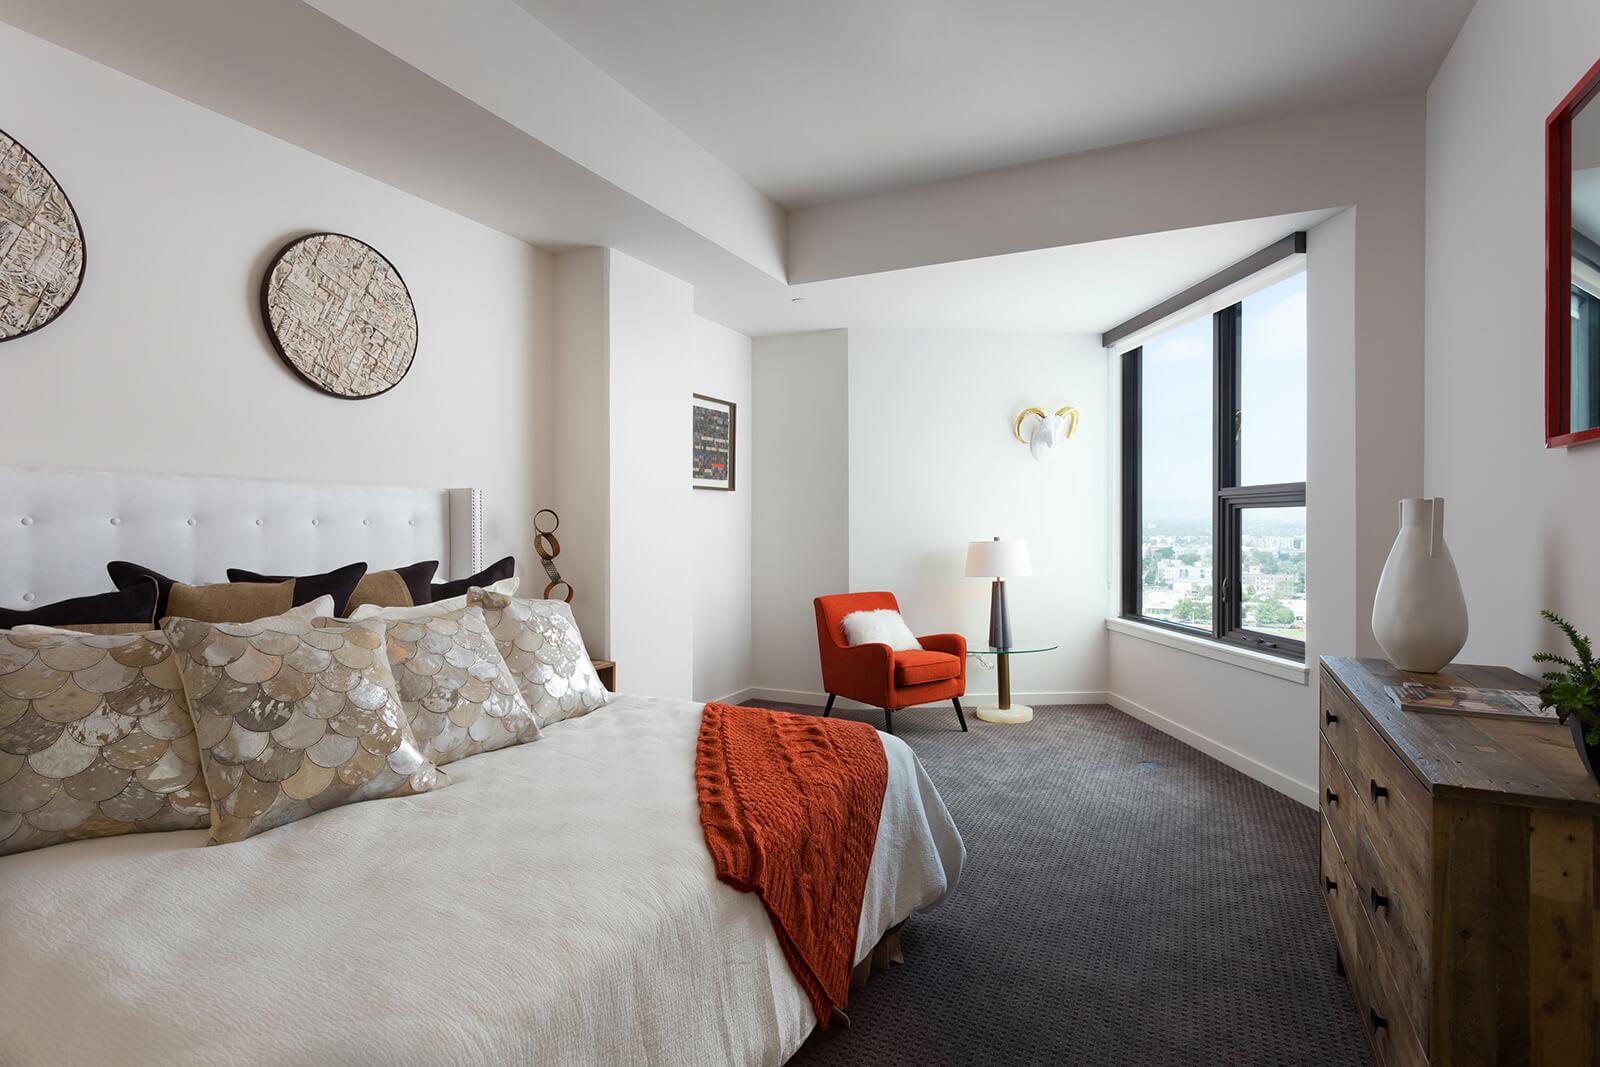 Plush Carpeting in Bedrooms at 1000 Speer by Windsor, Denver, Colorado